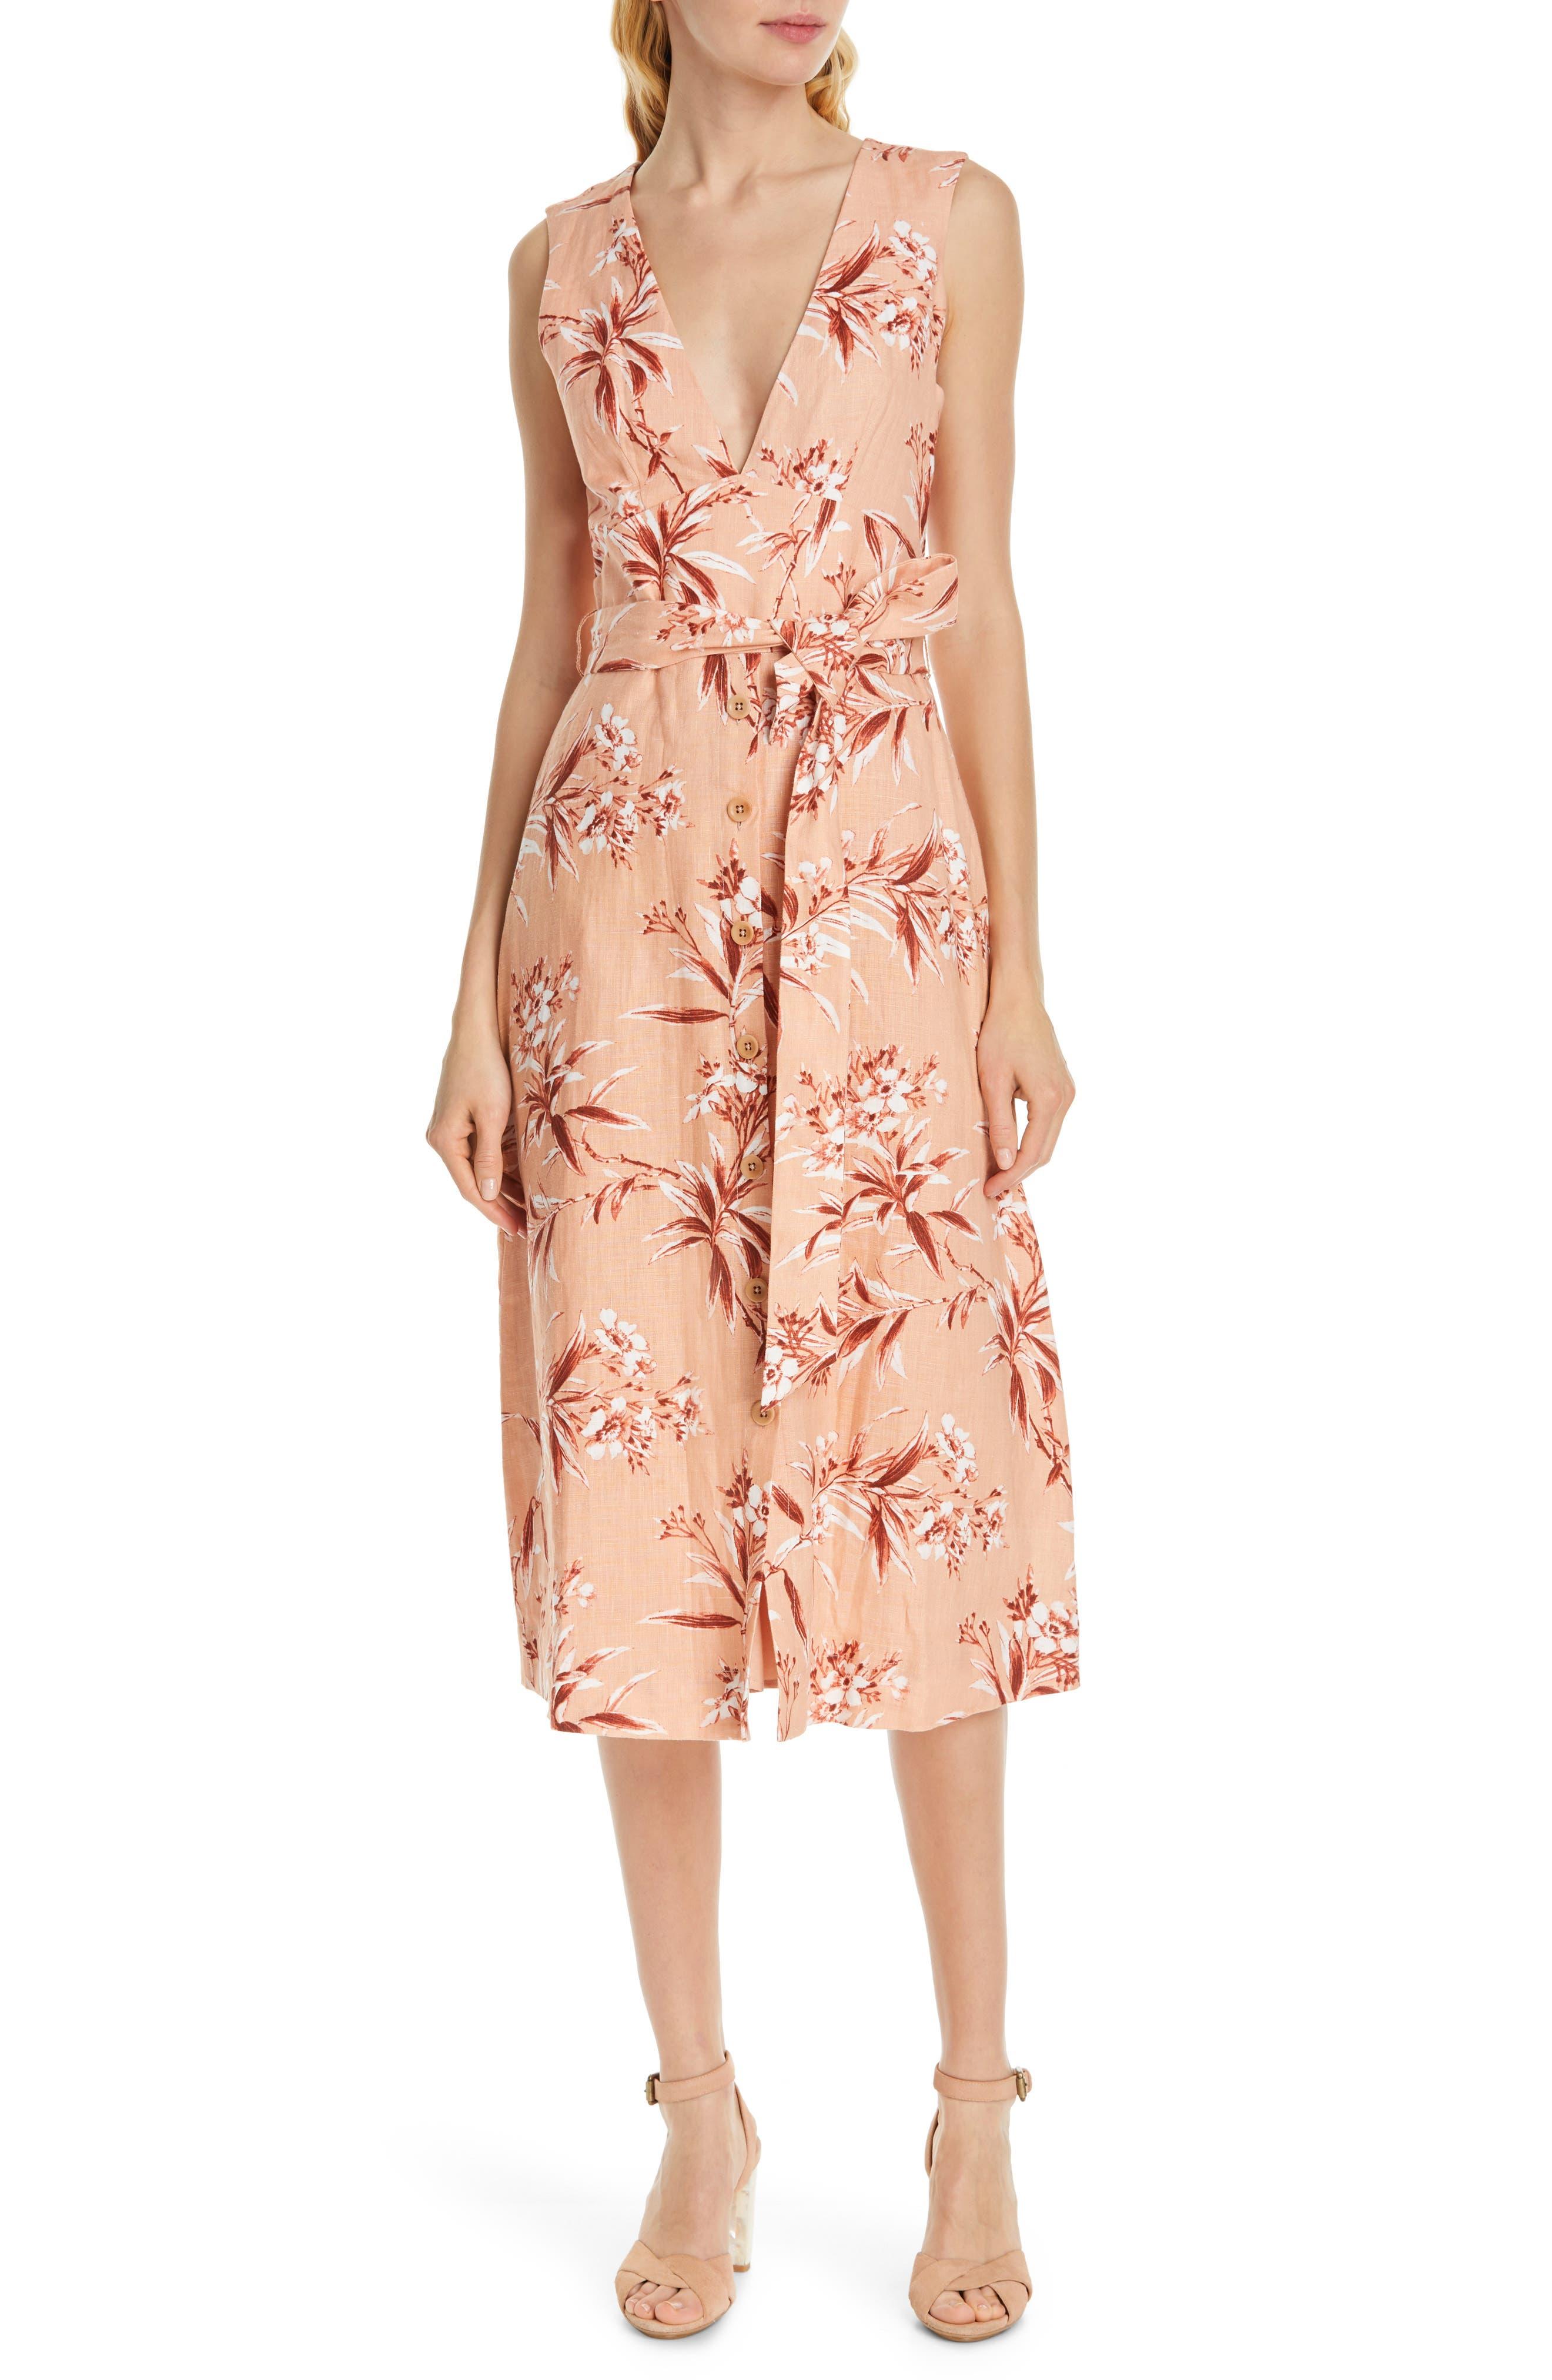 Joie Ethelda Floral Midi Linen Dress, Pink